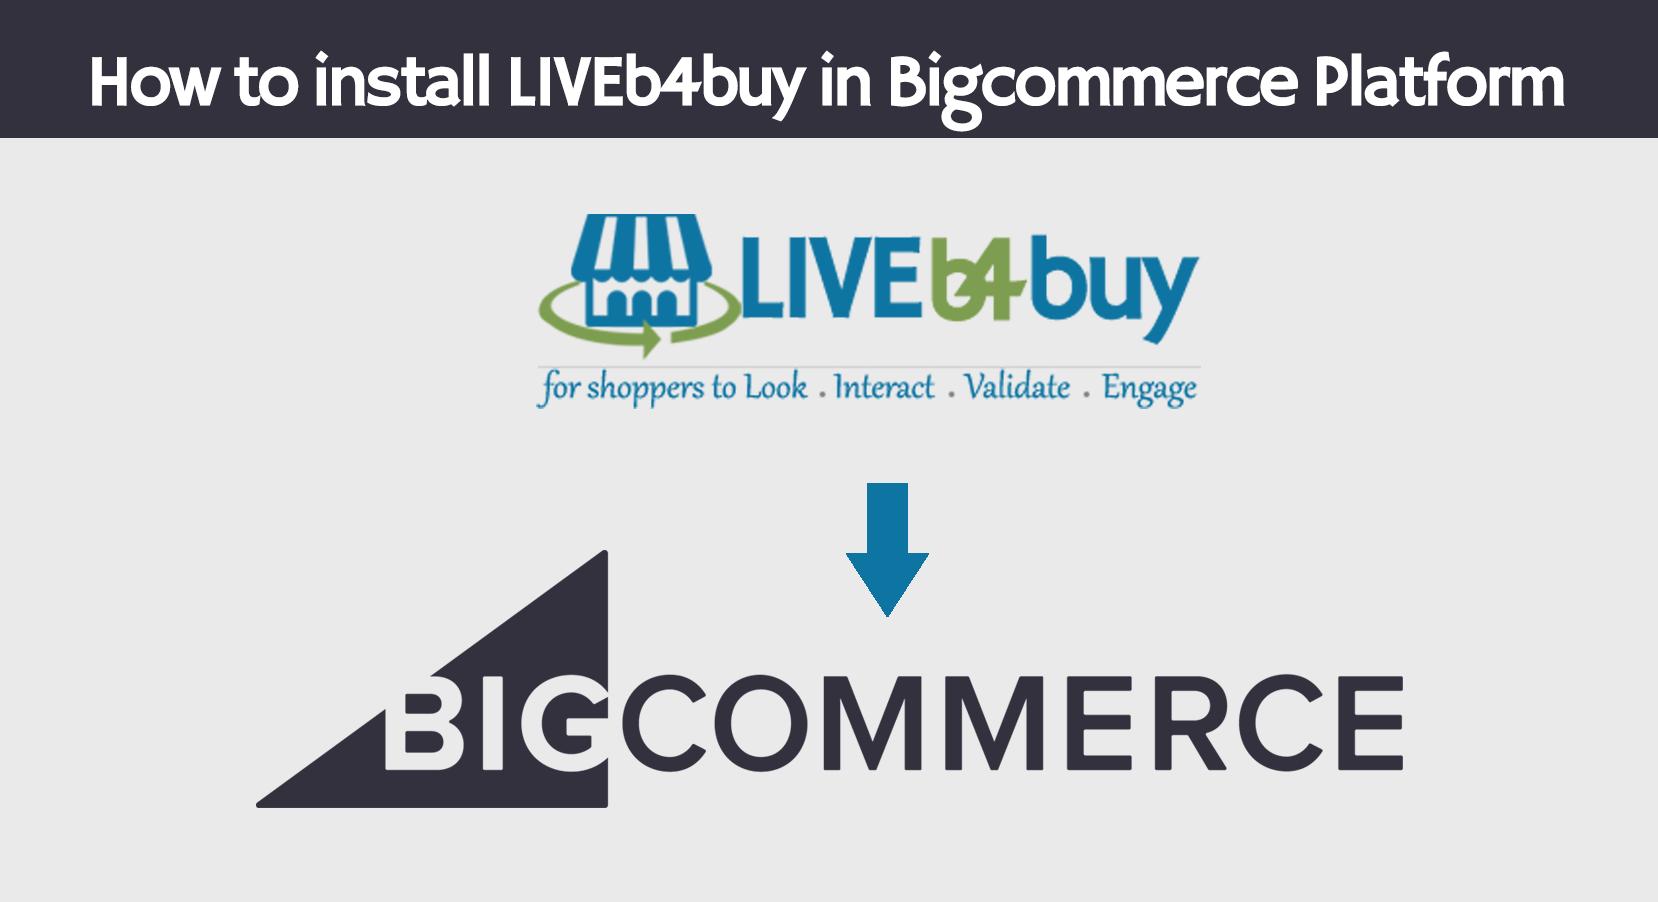 Install LIVEb4buy in Bigcommerce